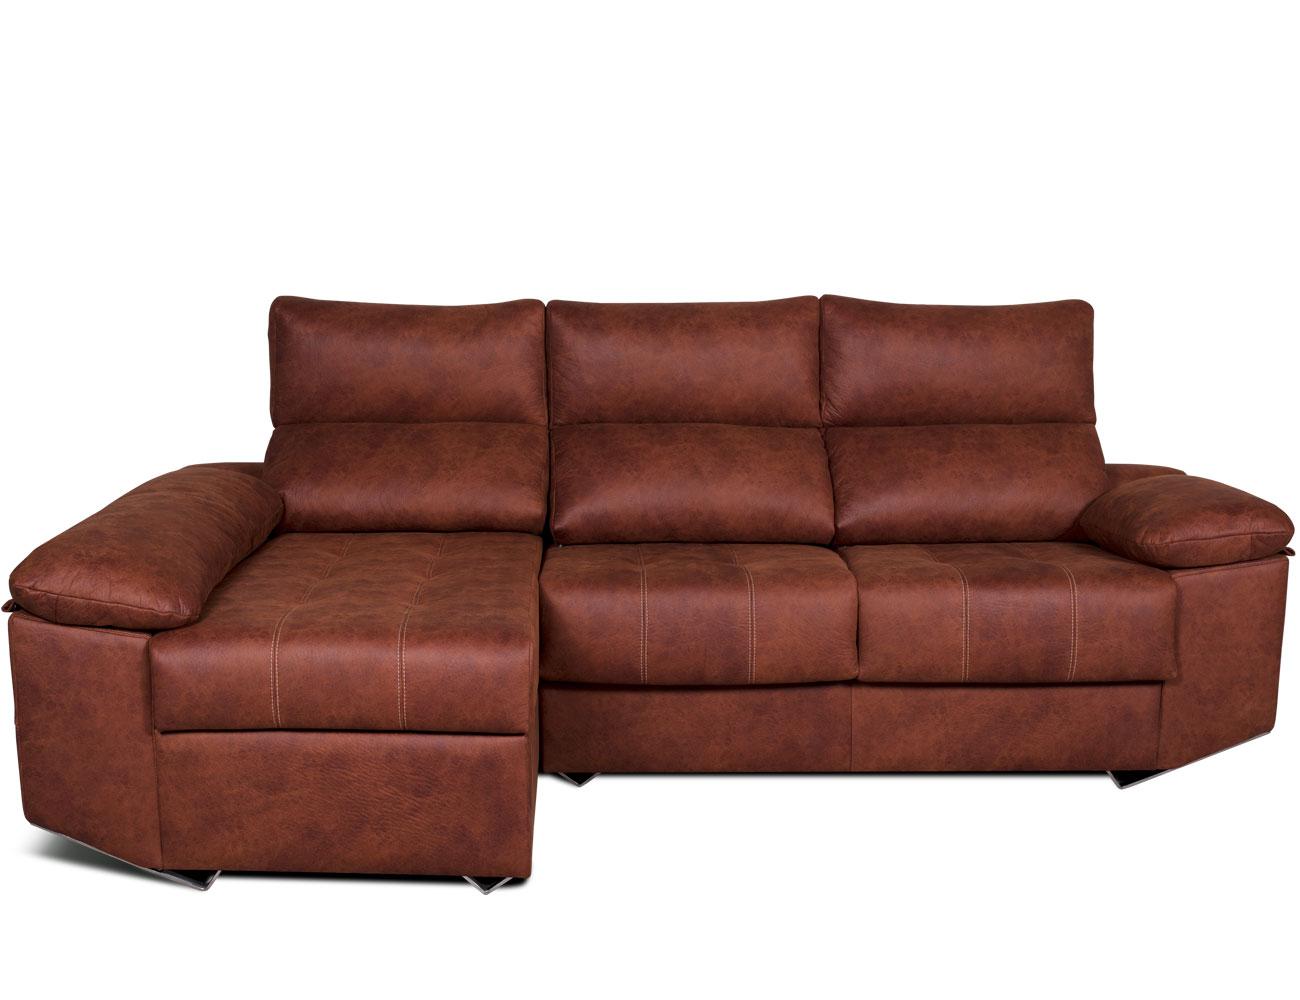 Sofa chaiselongue moderno patas forma tejido anti manchas 28